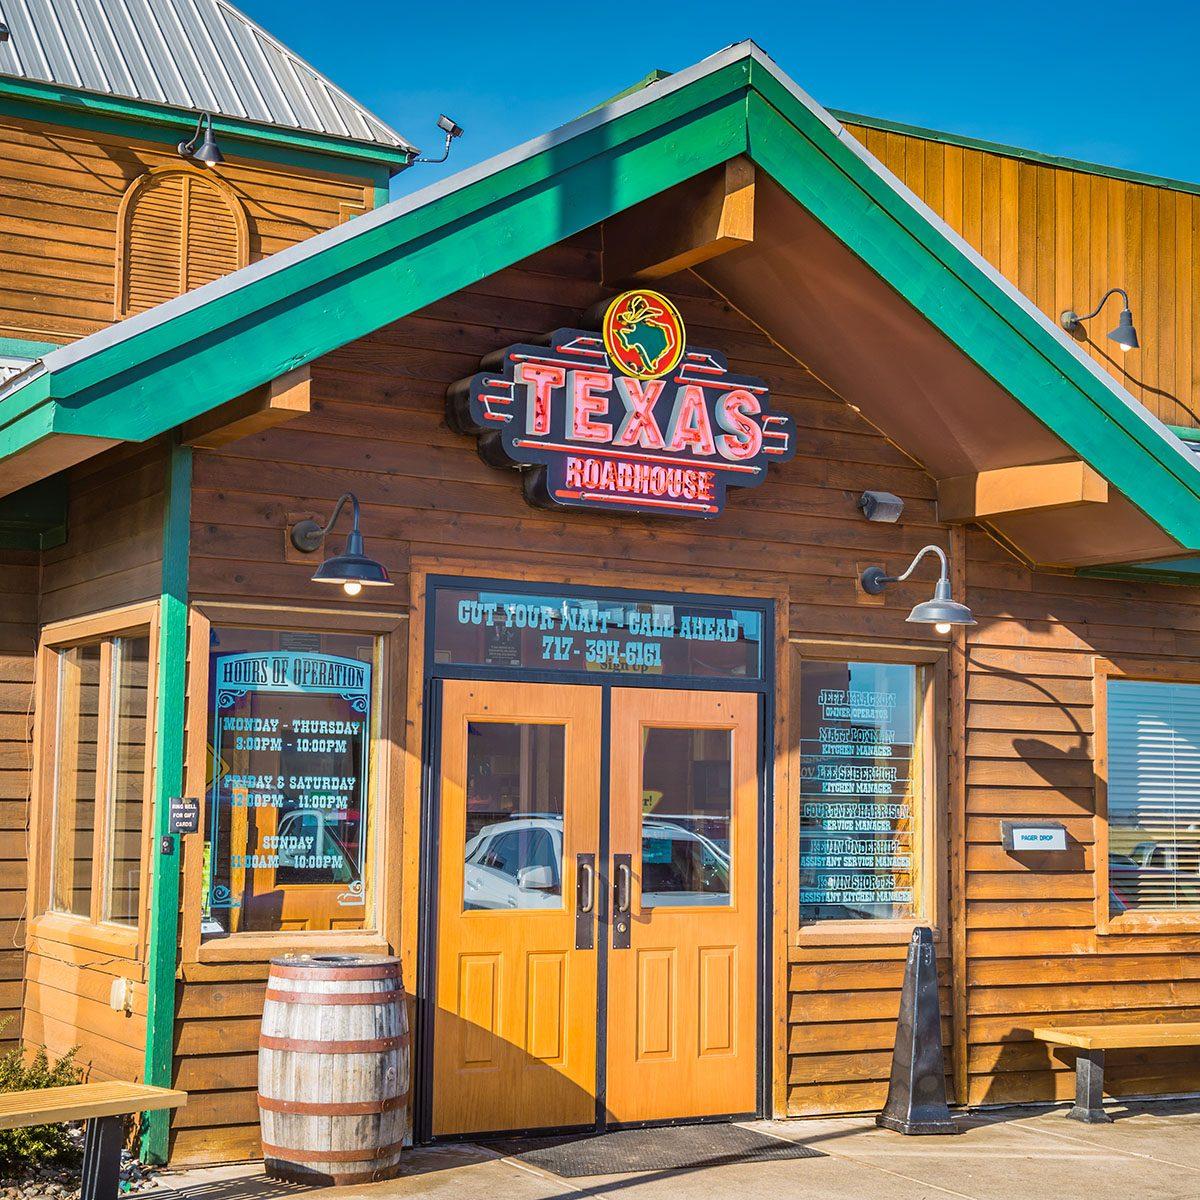 Exterior of Texas Roadhouse restaurant location.